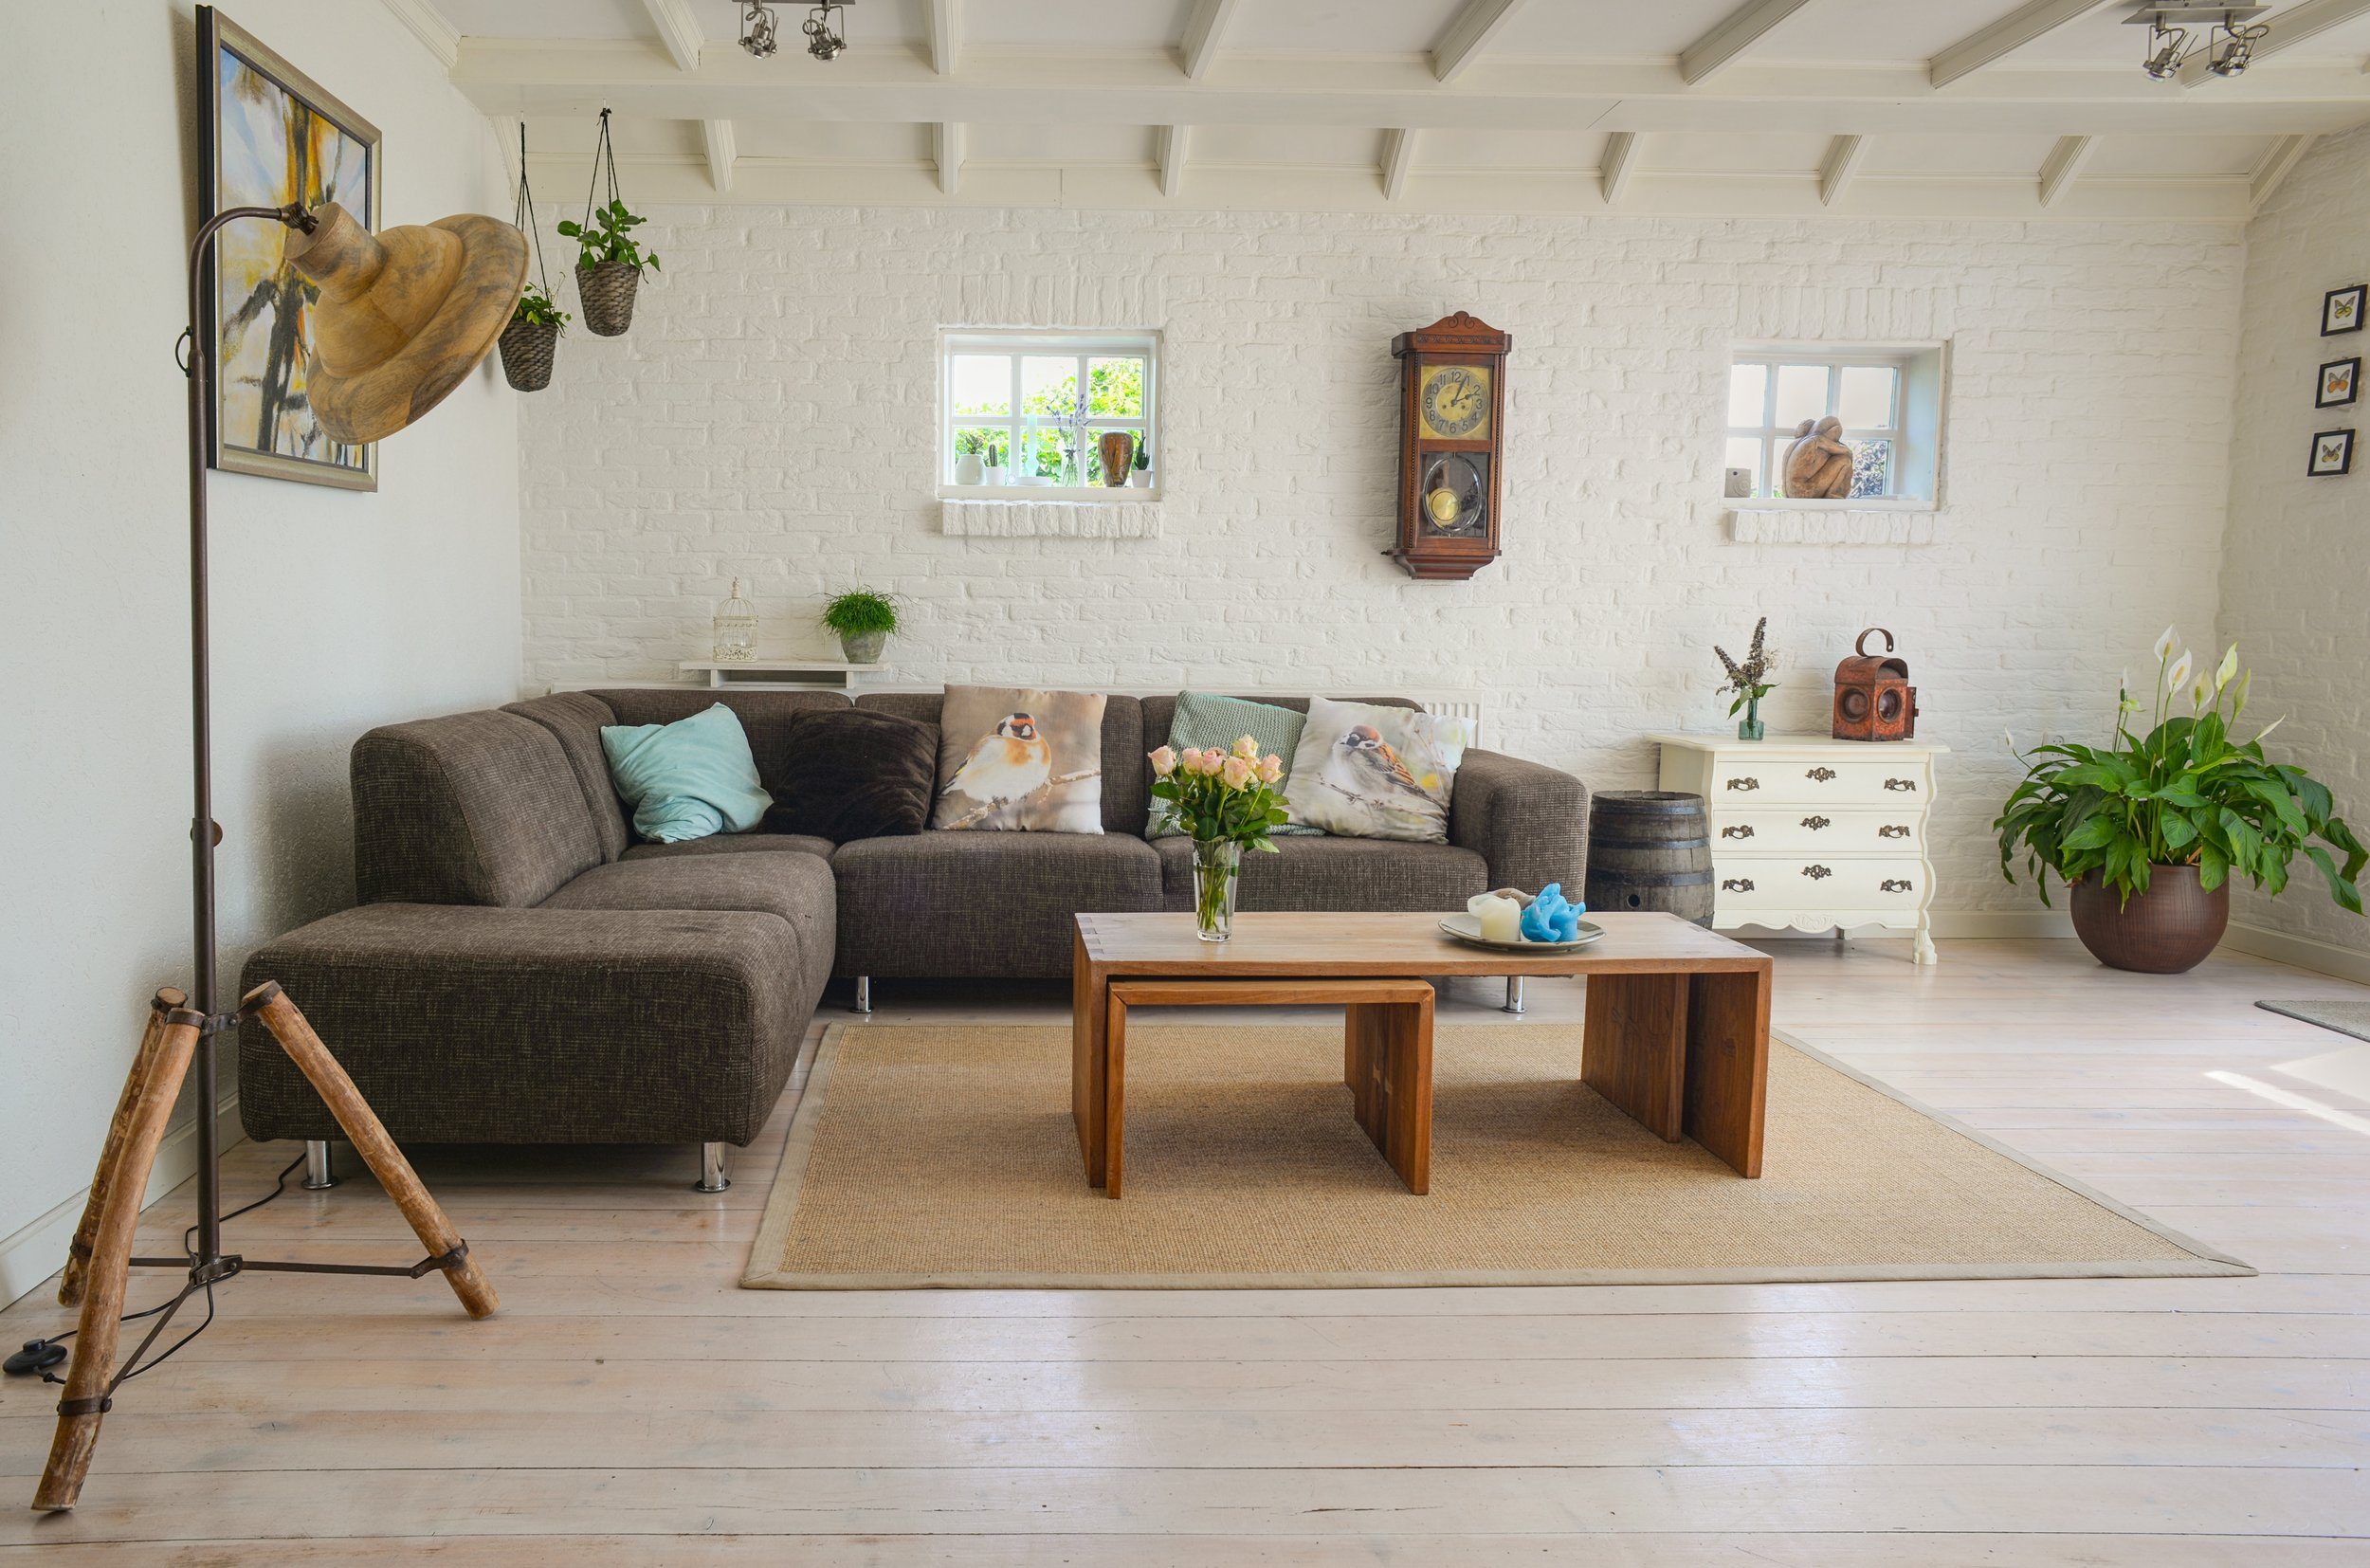 airbnb-apartment-appartment-584399.jpg